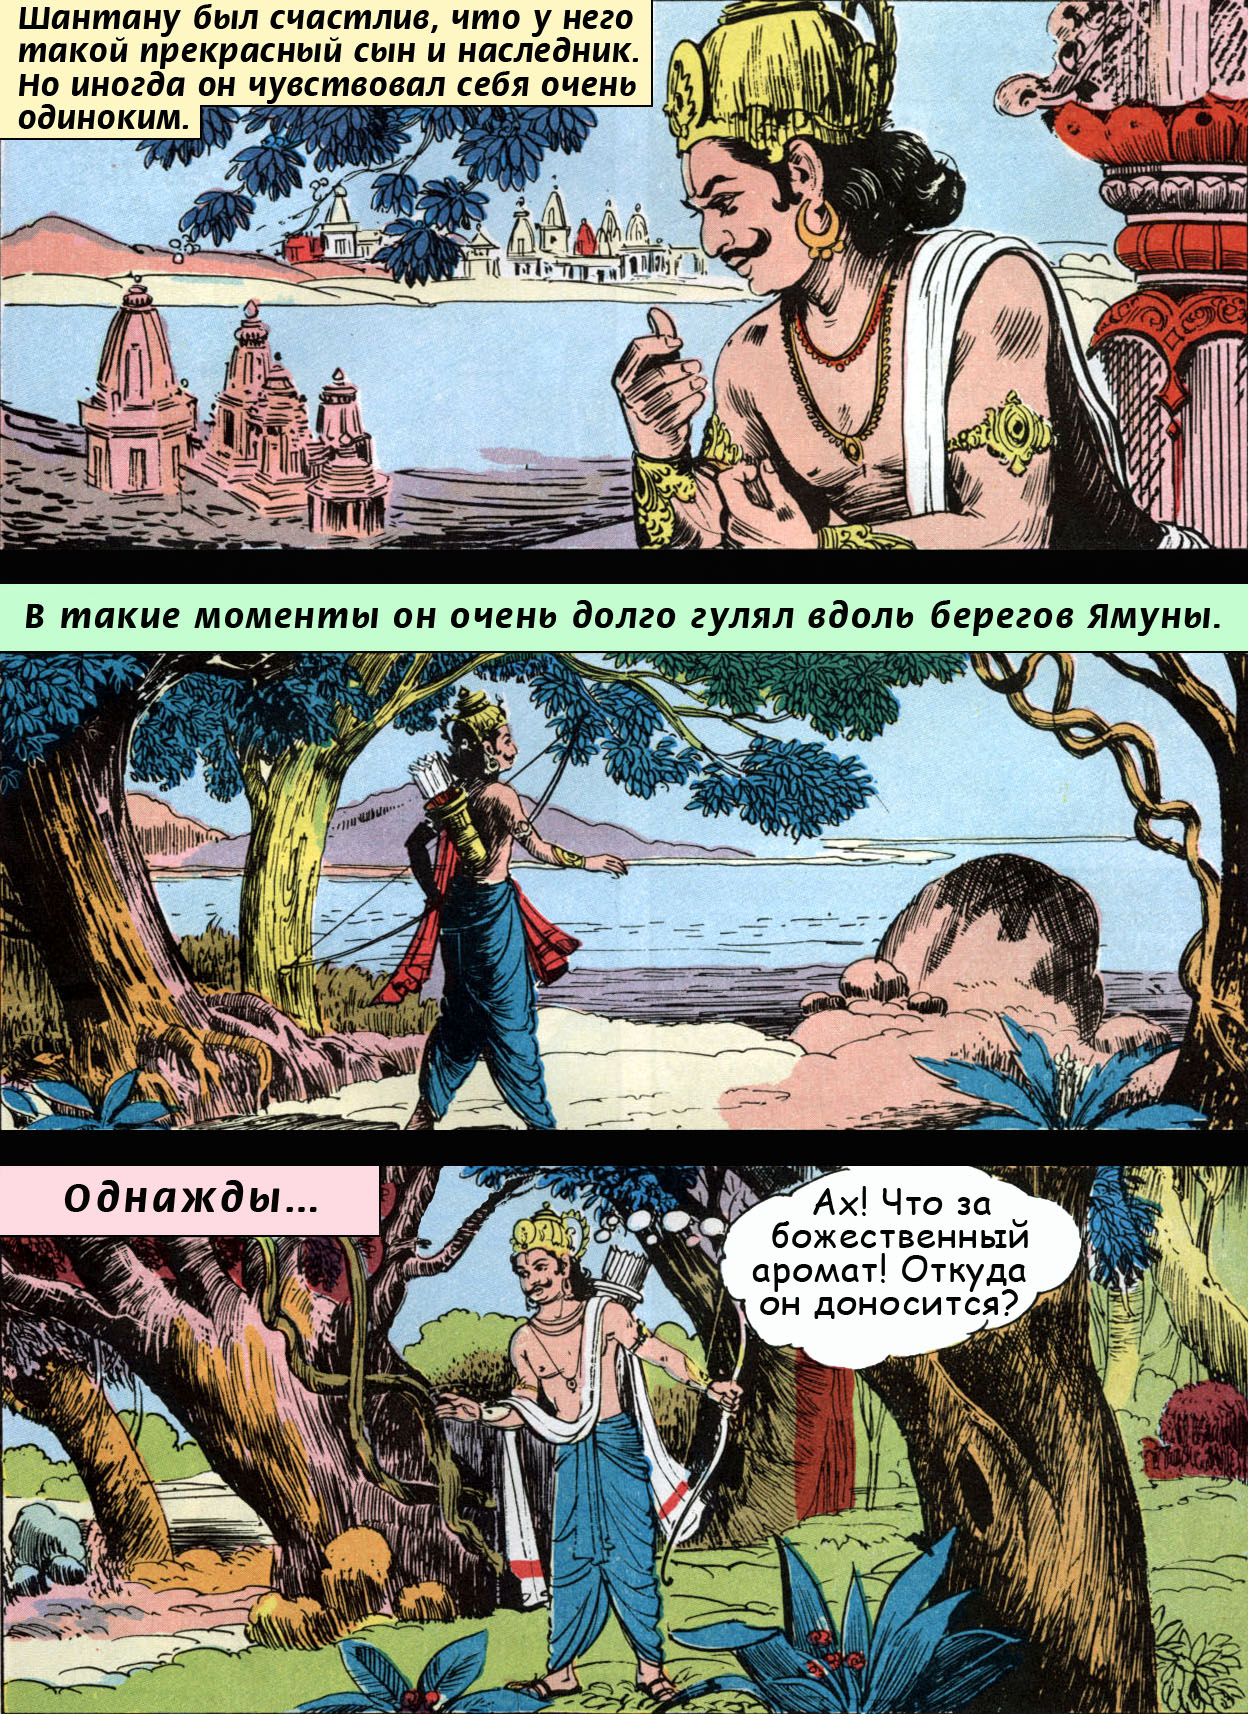 Бхишма 11 - ведический комикс